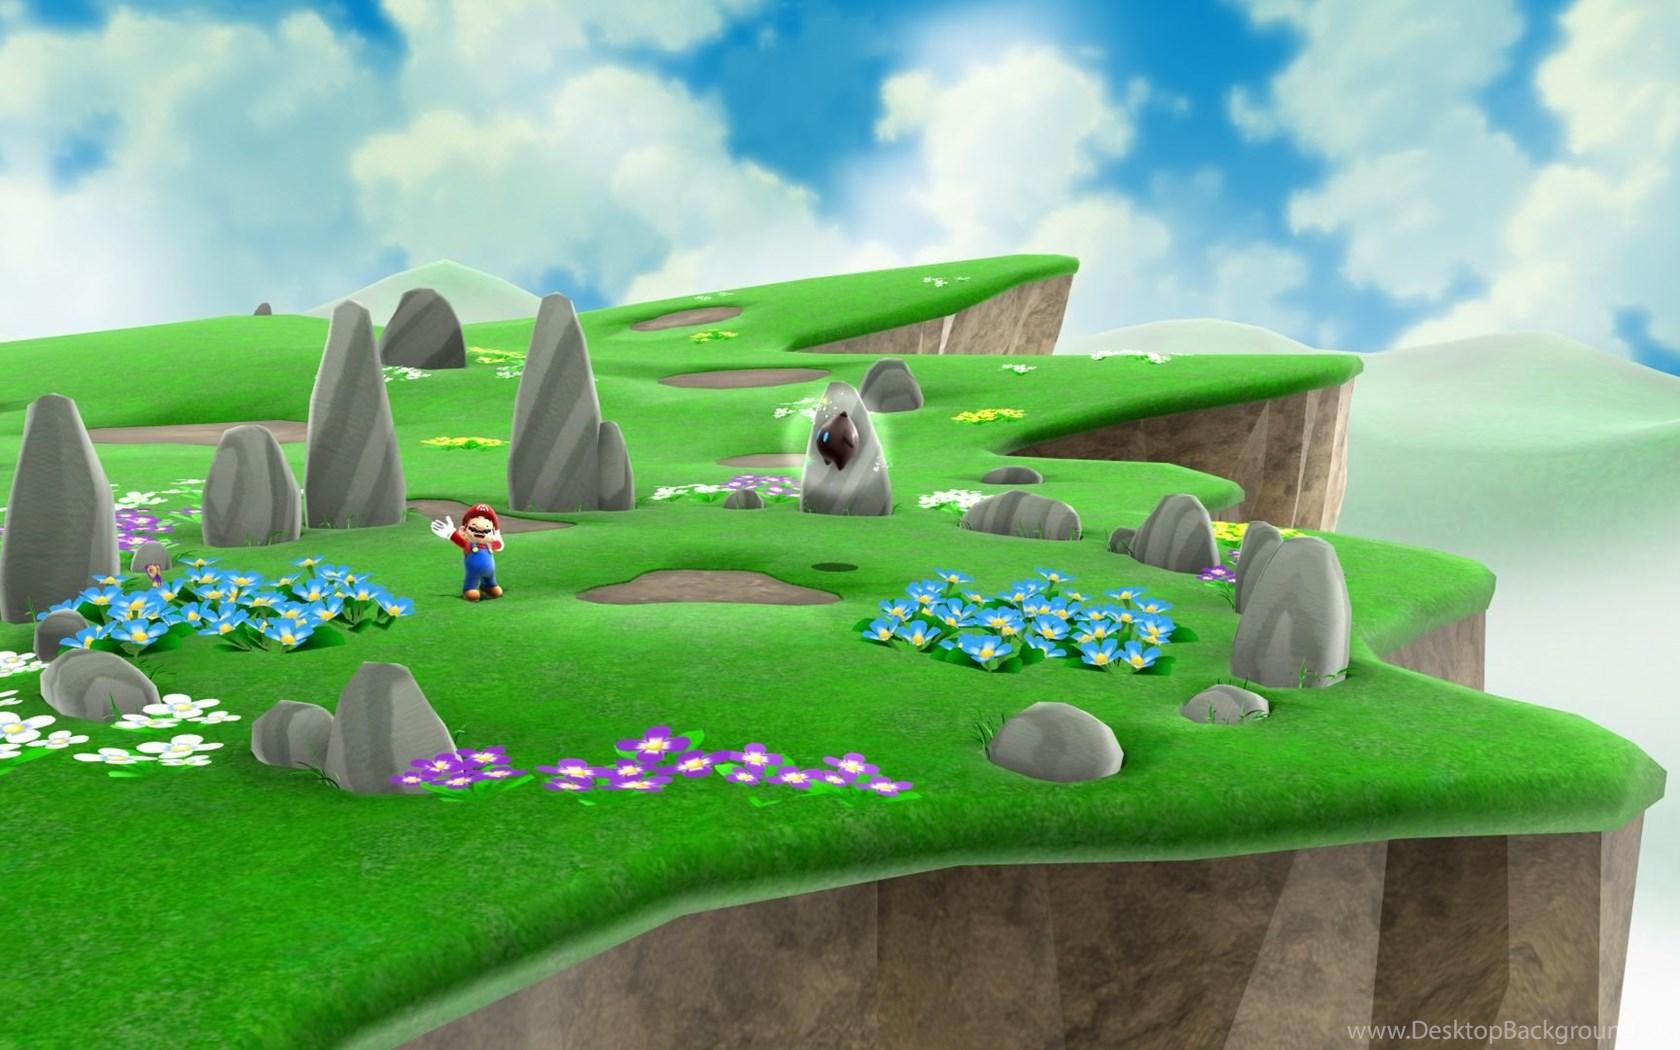 Nitando Super Mario 3D World Wallpaper HD.jpg Desktop Background